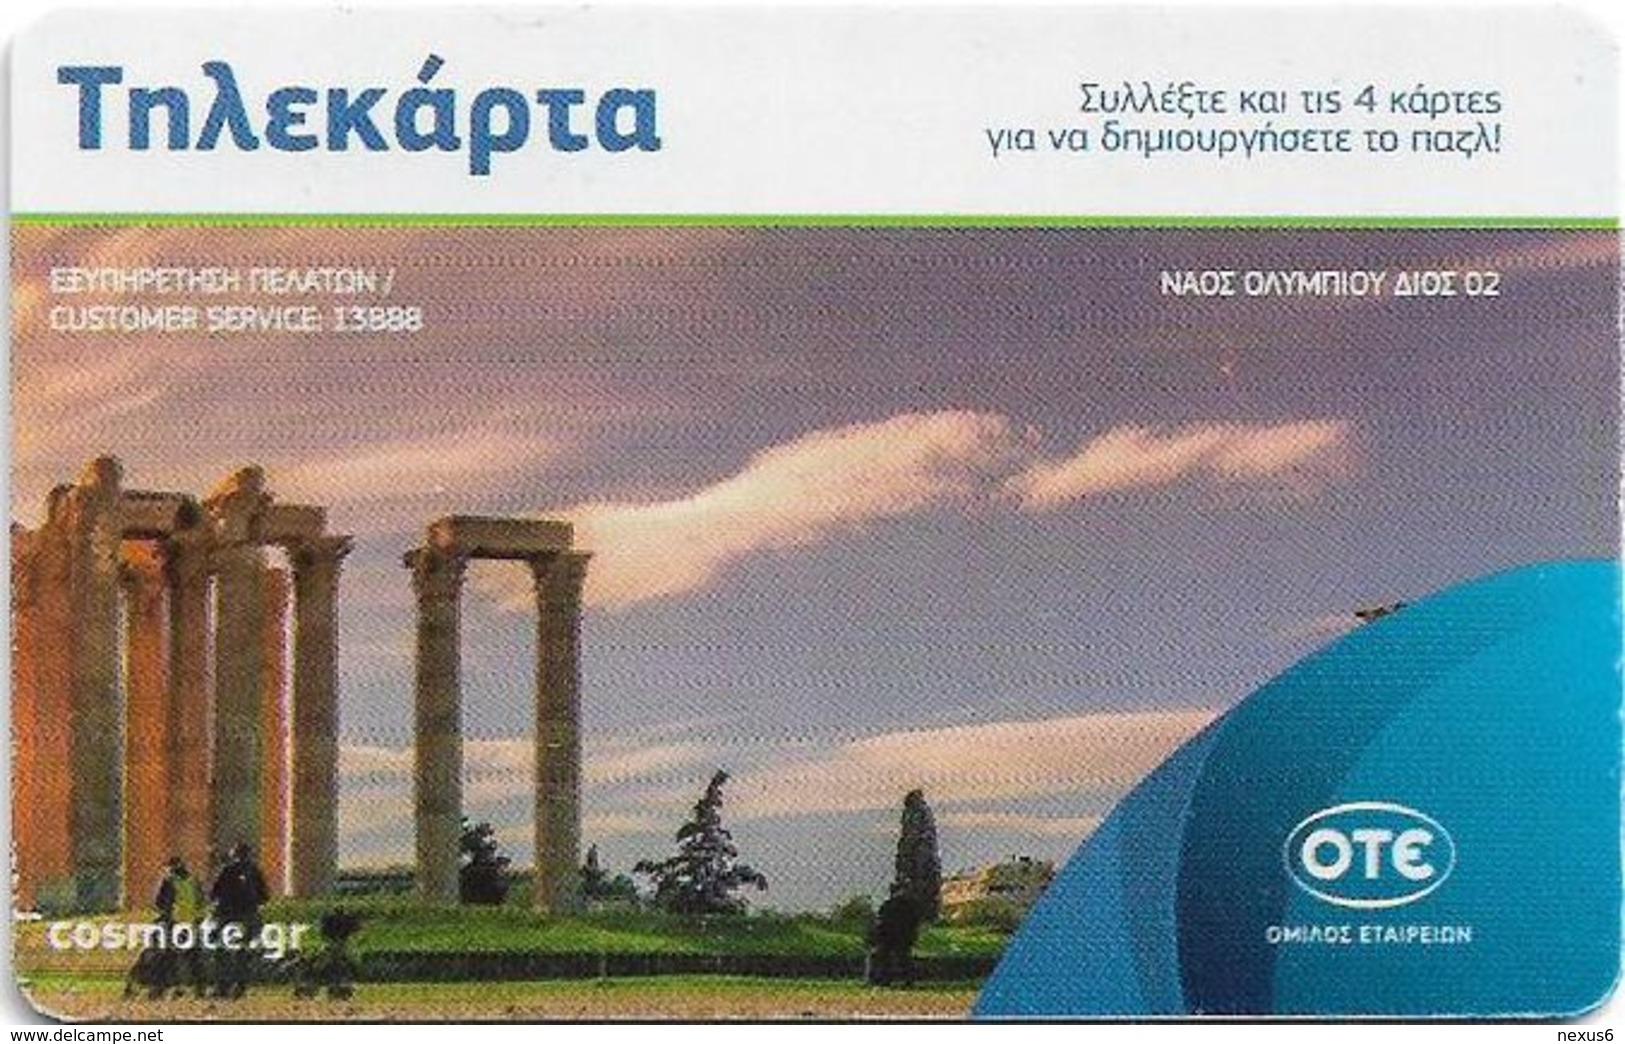 Greece - Temple Of Olympian Zeus 2/4, M189 (FV 10€) 07.2019, 40.000ex, Used - Grecia